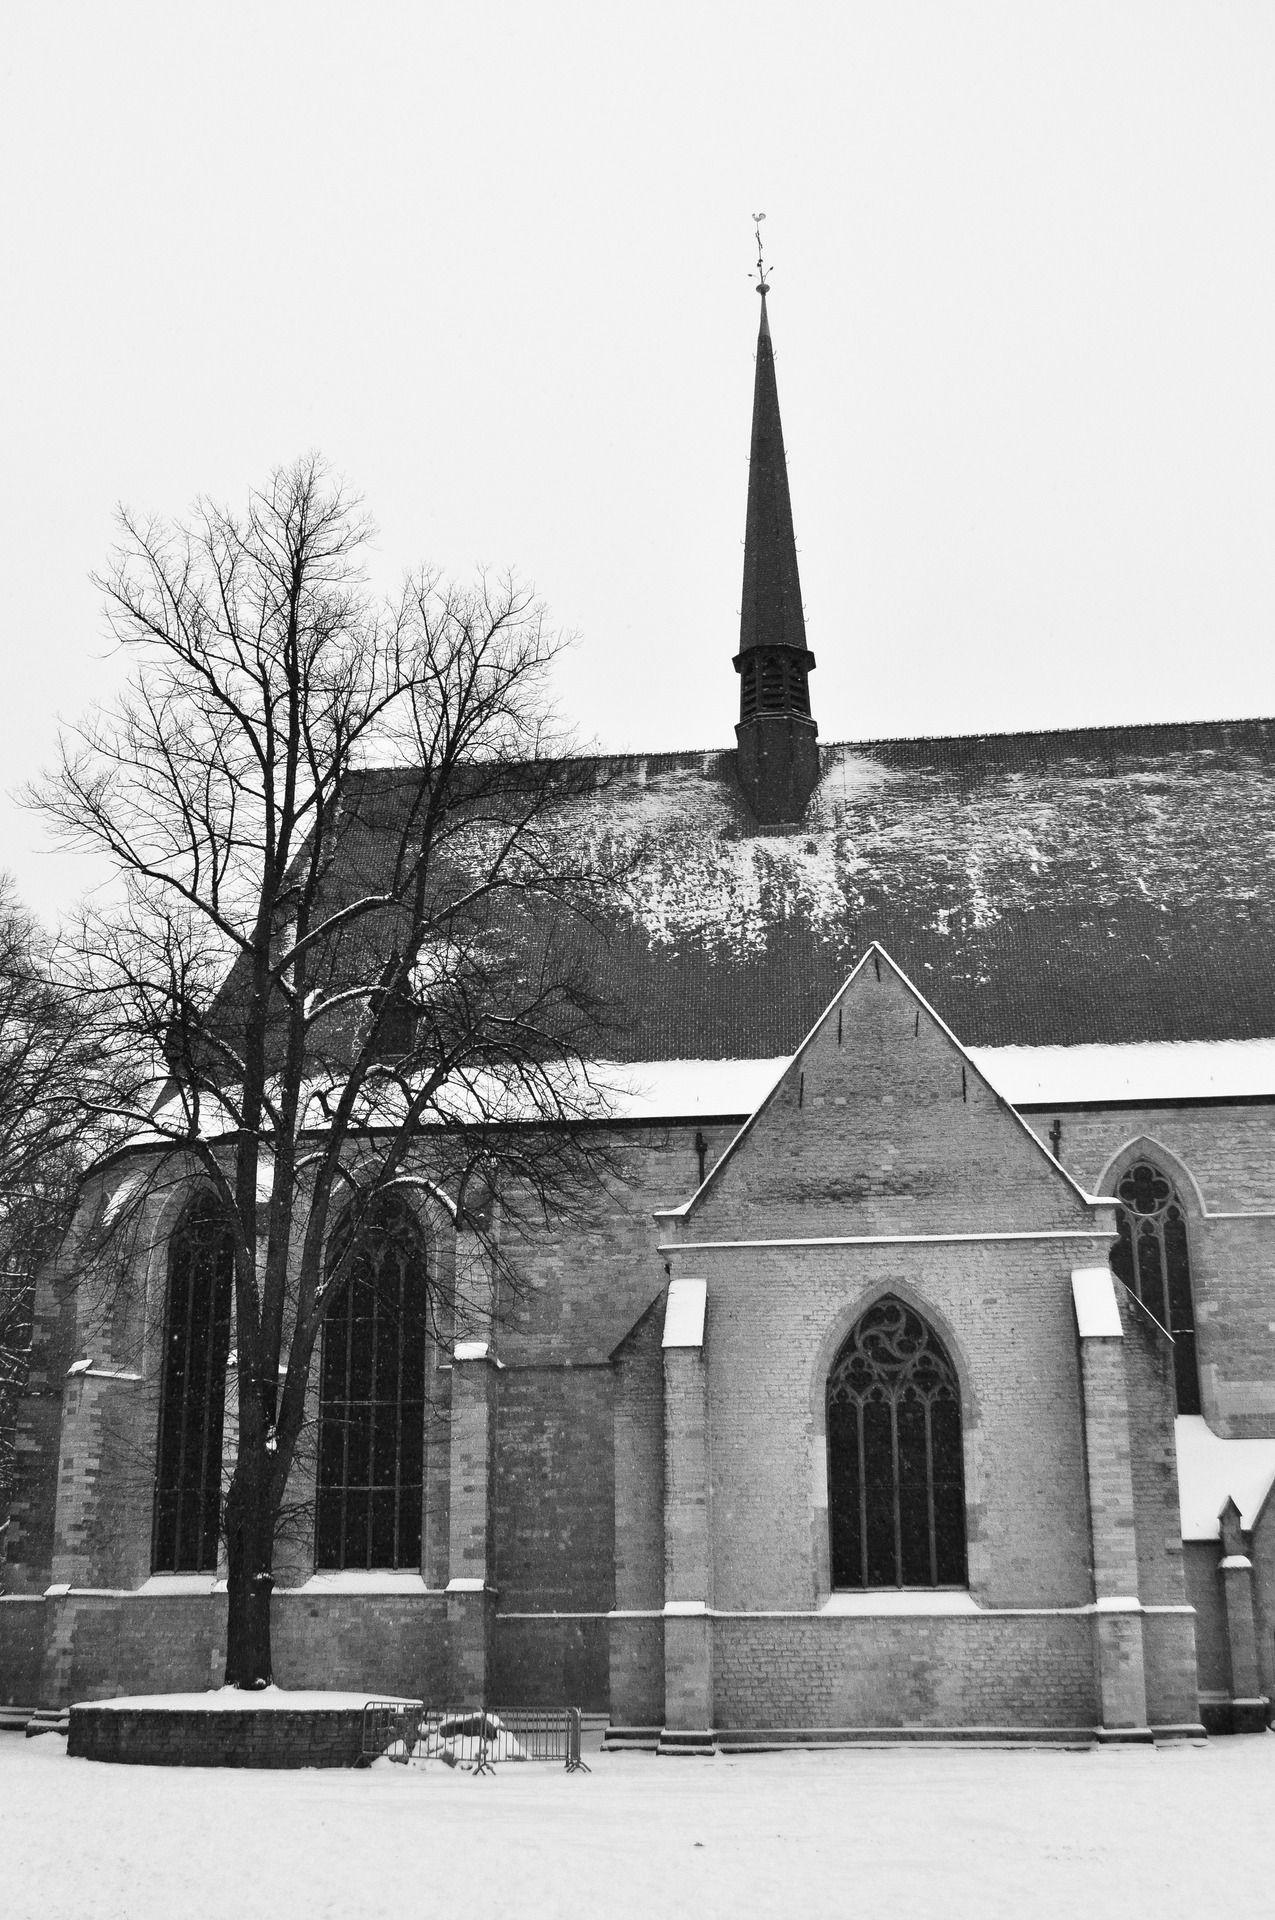 Abbey de la Cambre - Brussels, Belgium